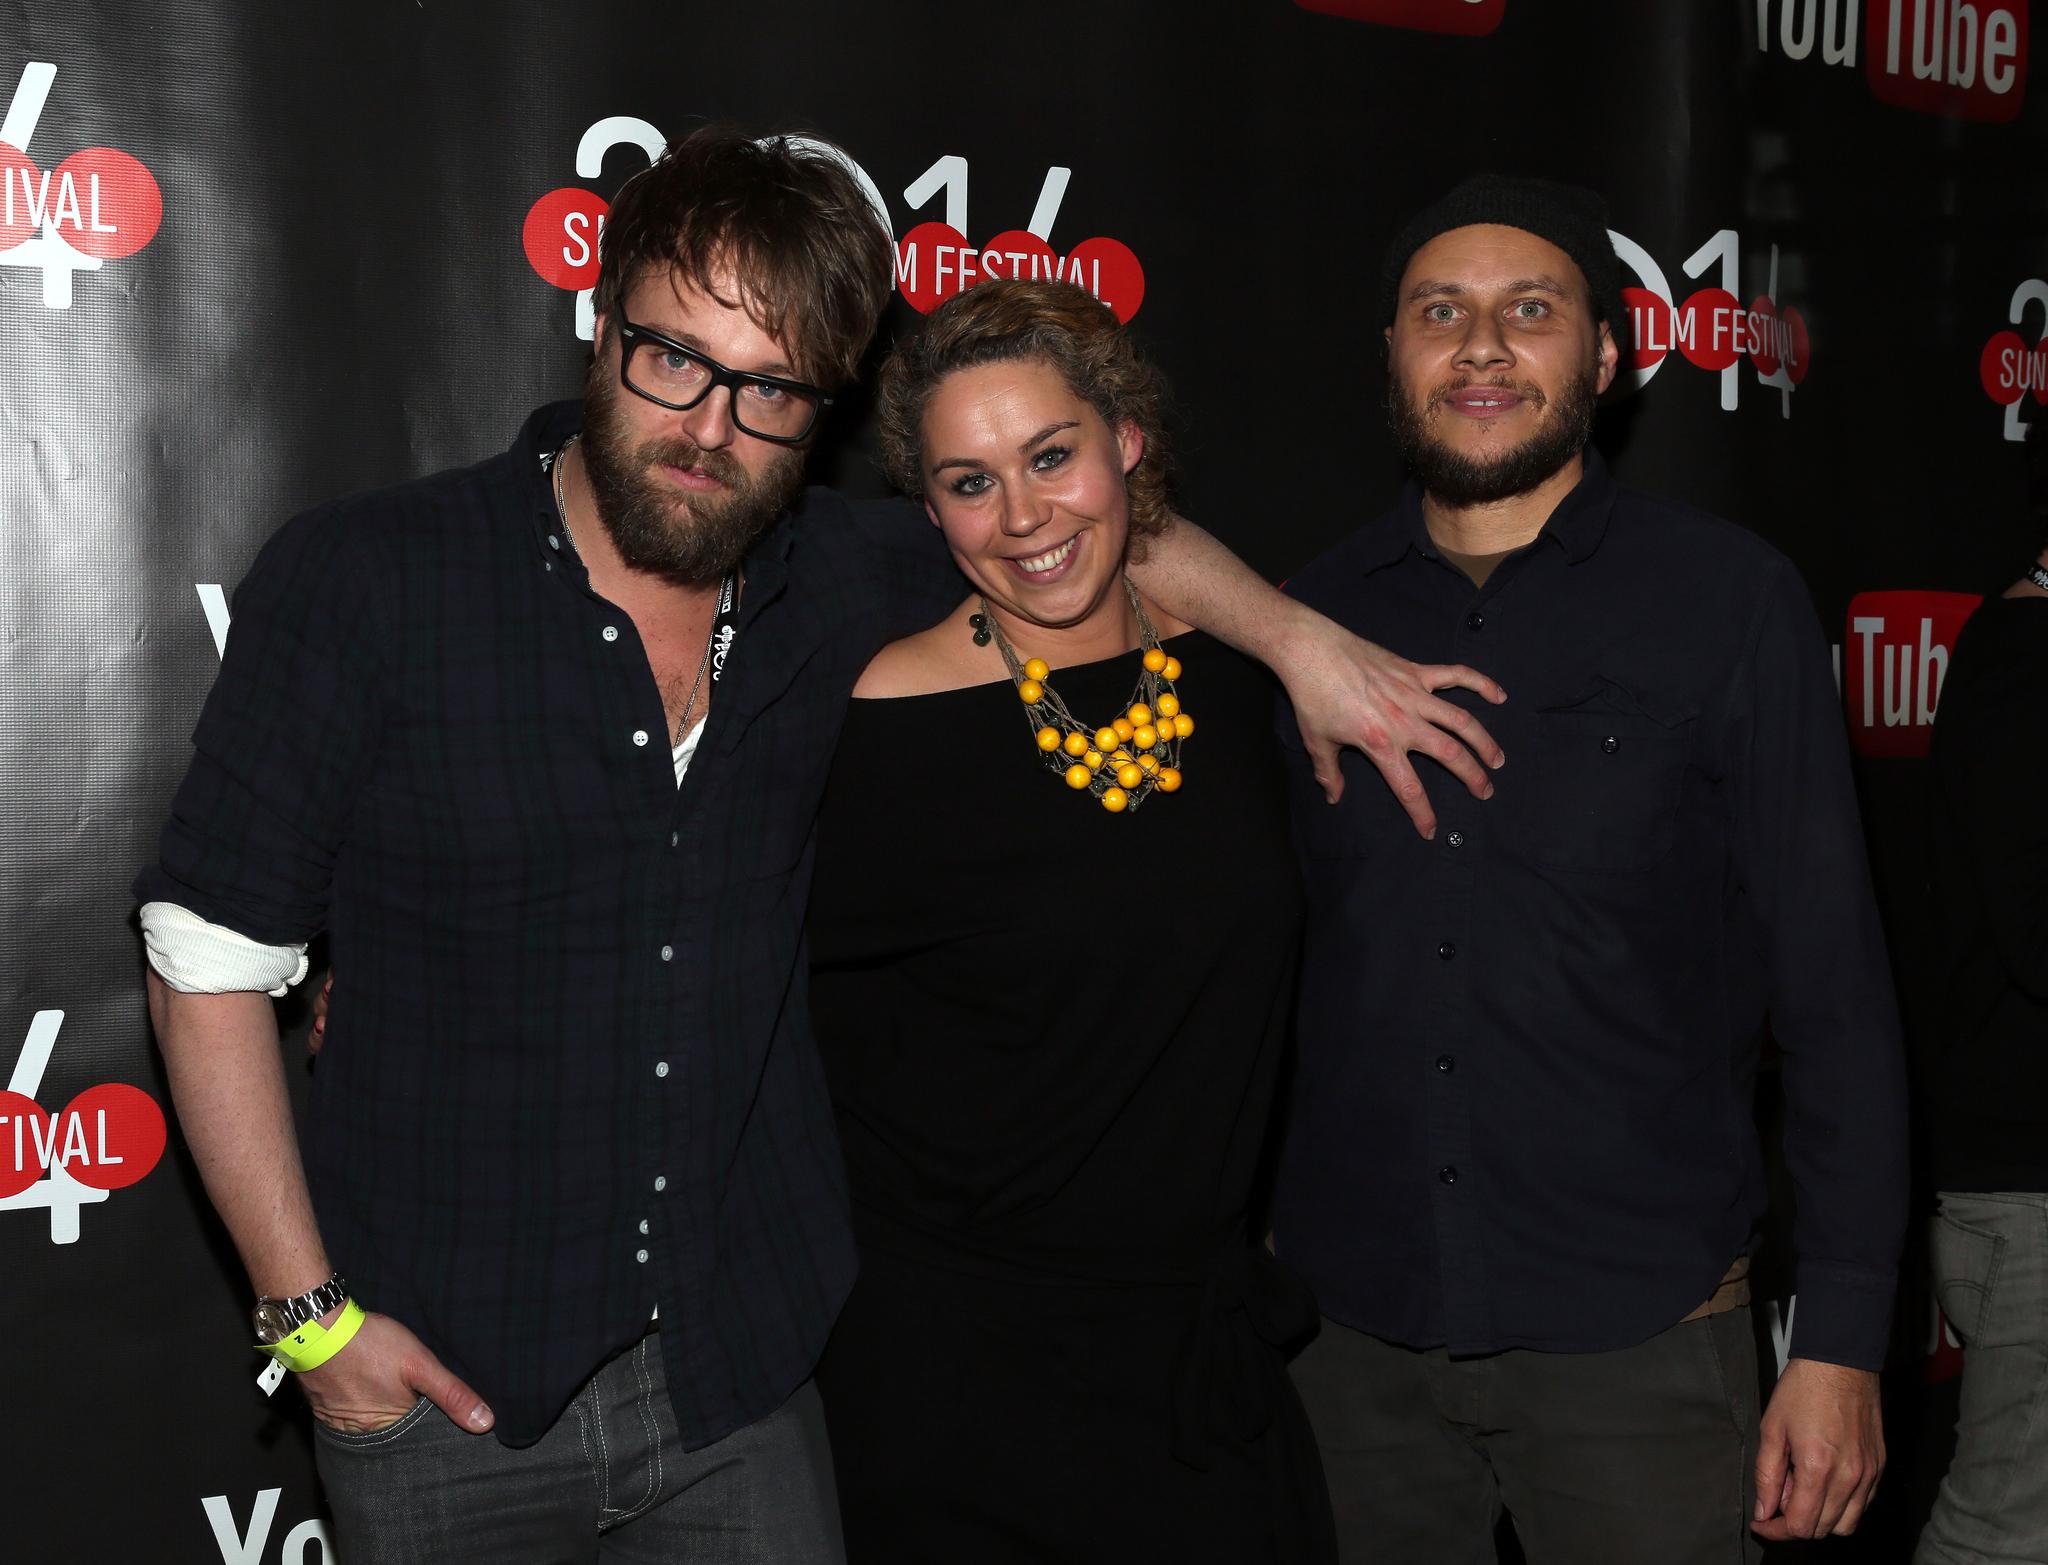 Vernon Chatman, Joshua Leonard, and Ania Trzebiatowska